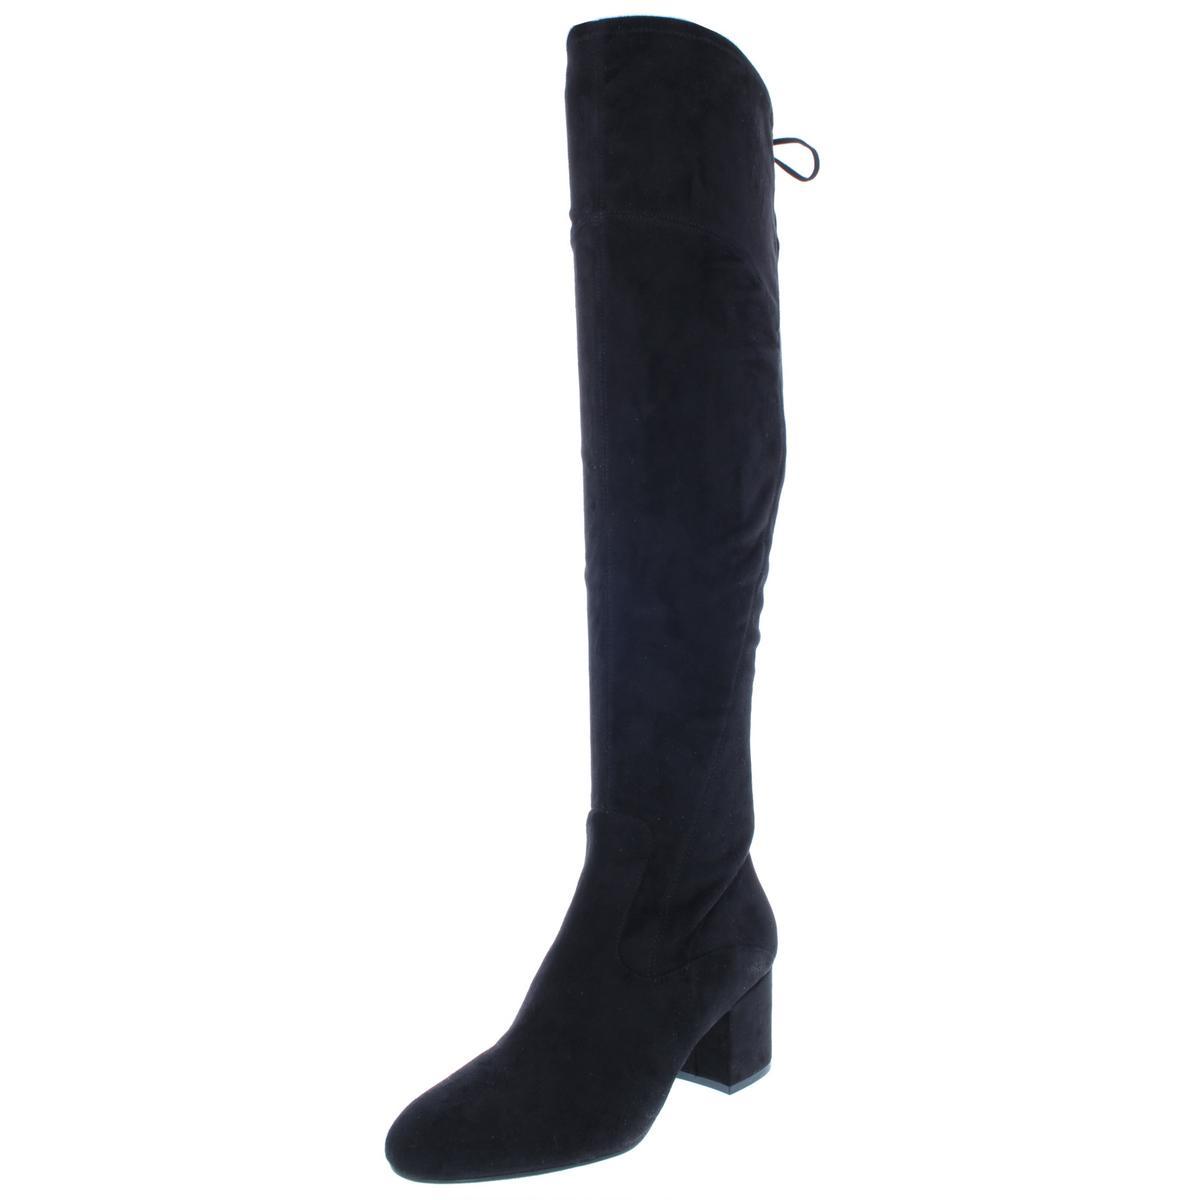 Ivanka Trump Damenschuhe Pelinda Faux Suede Tall Tall Tall Over-The-Knee Stiefel Heels BHFO 9499 872a16